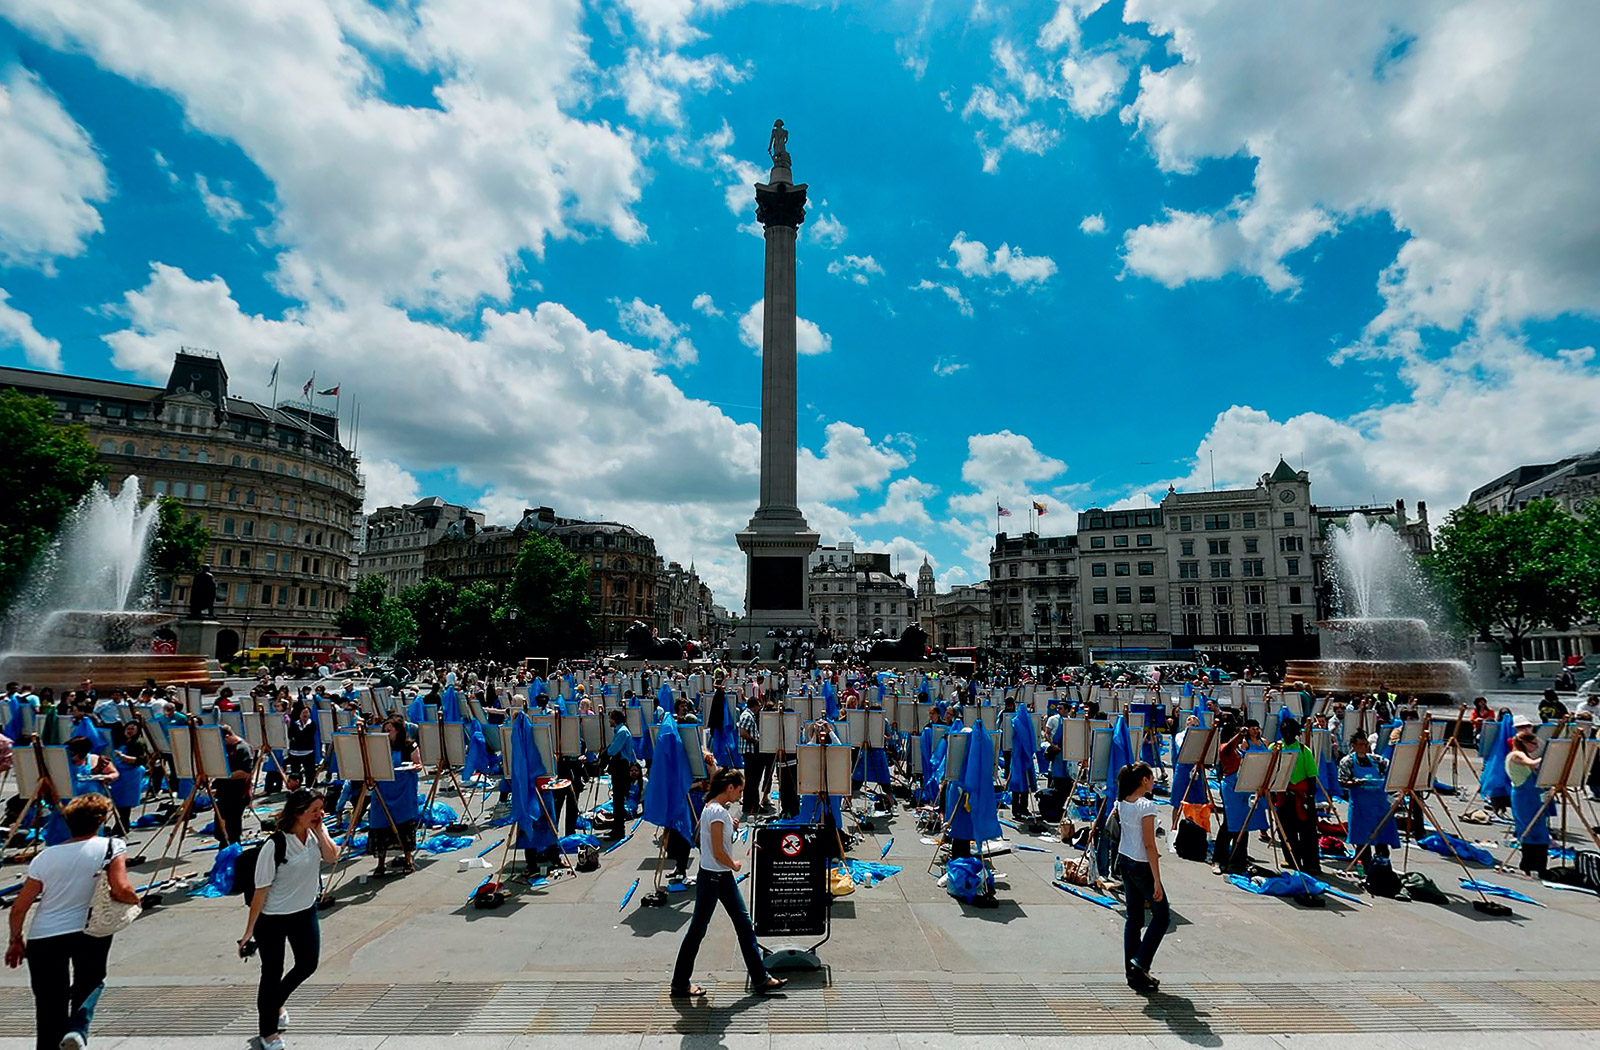 Blue Sky Day Trafalgar Square 360 Photography